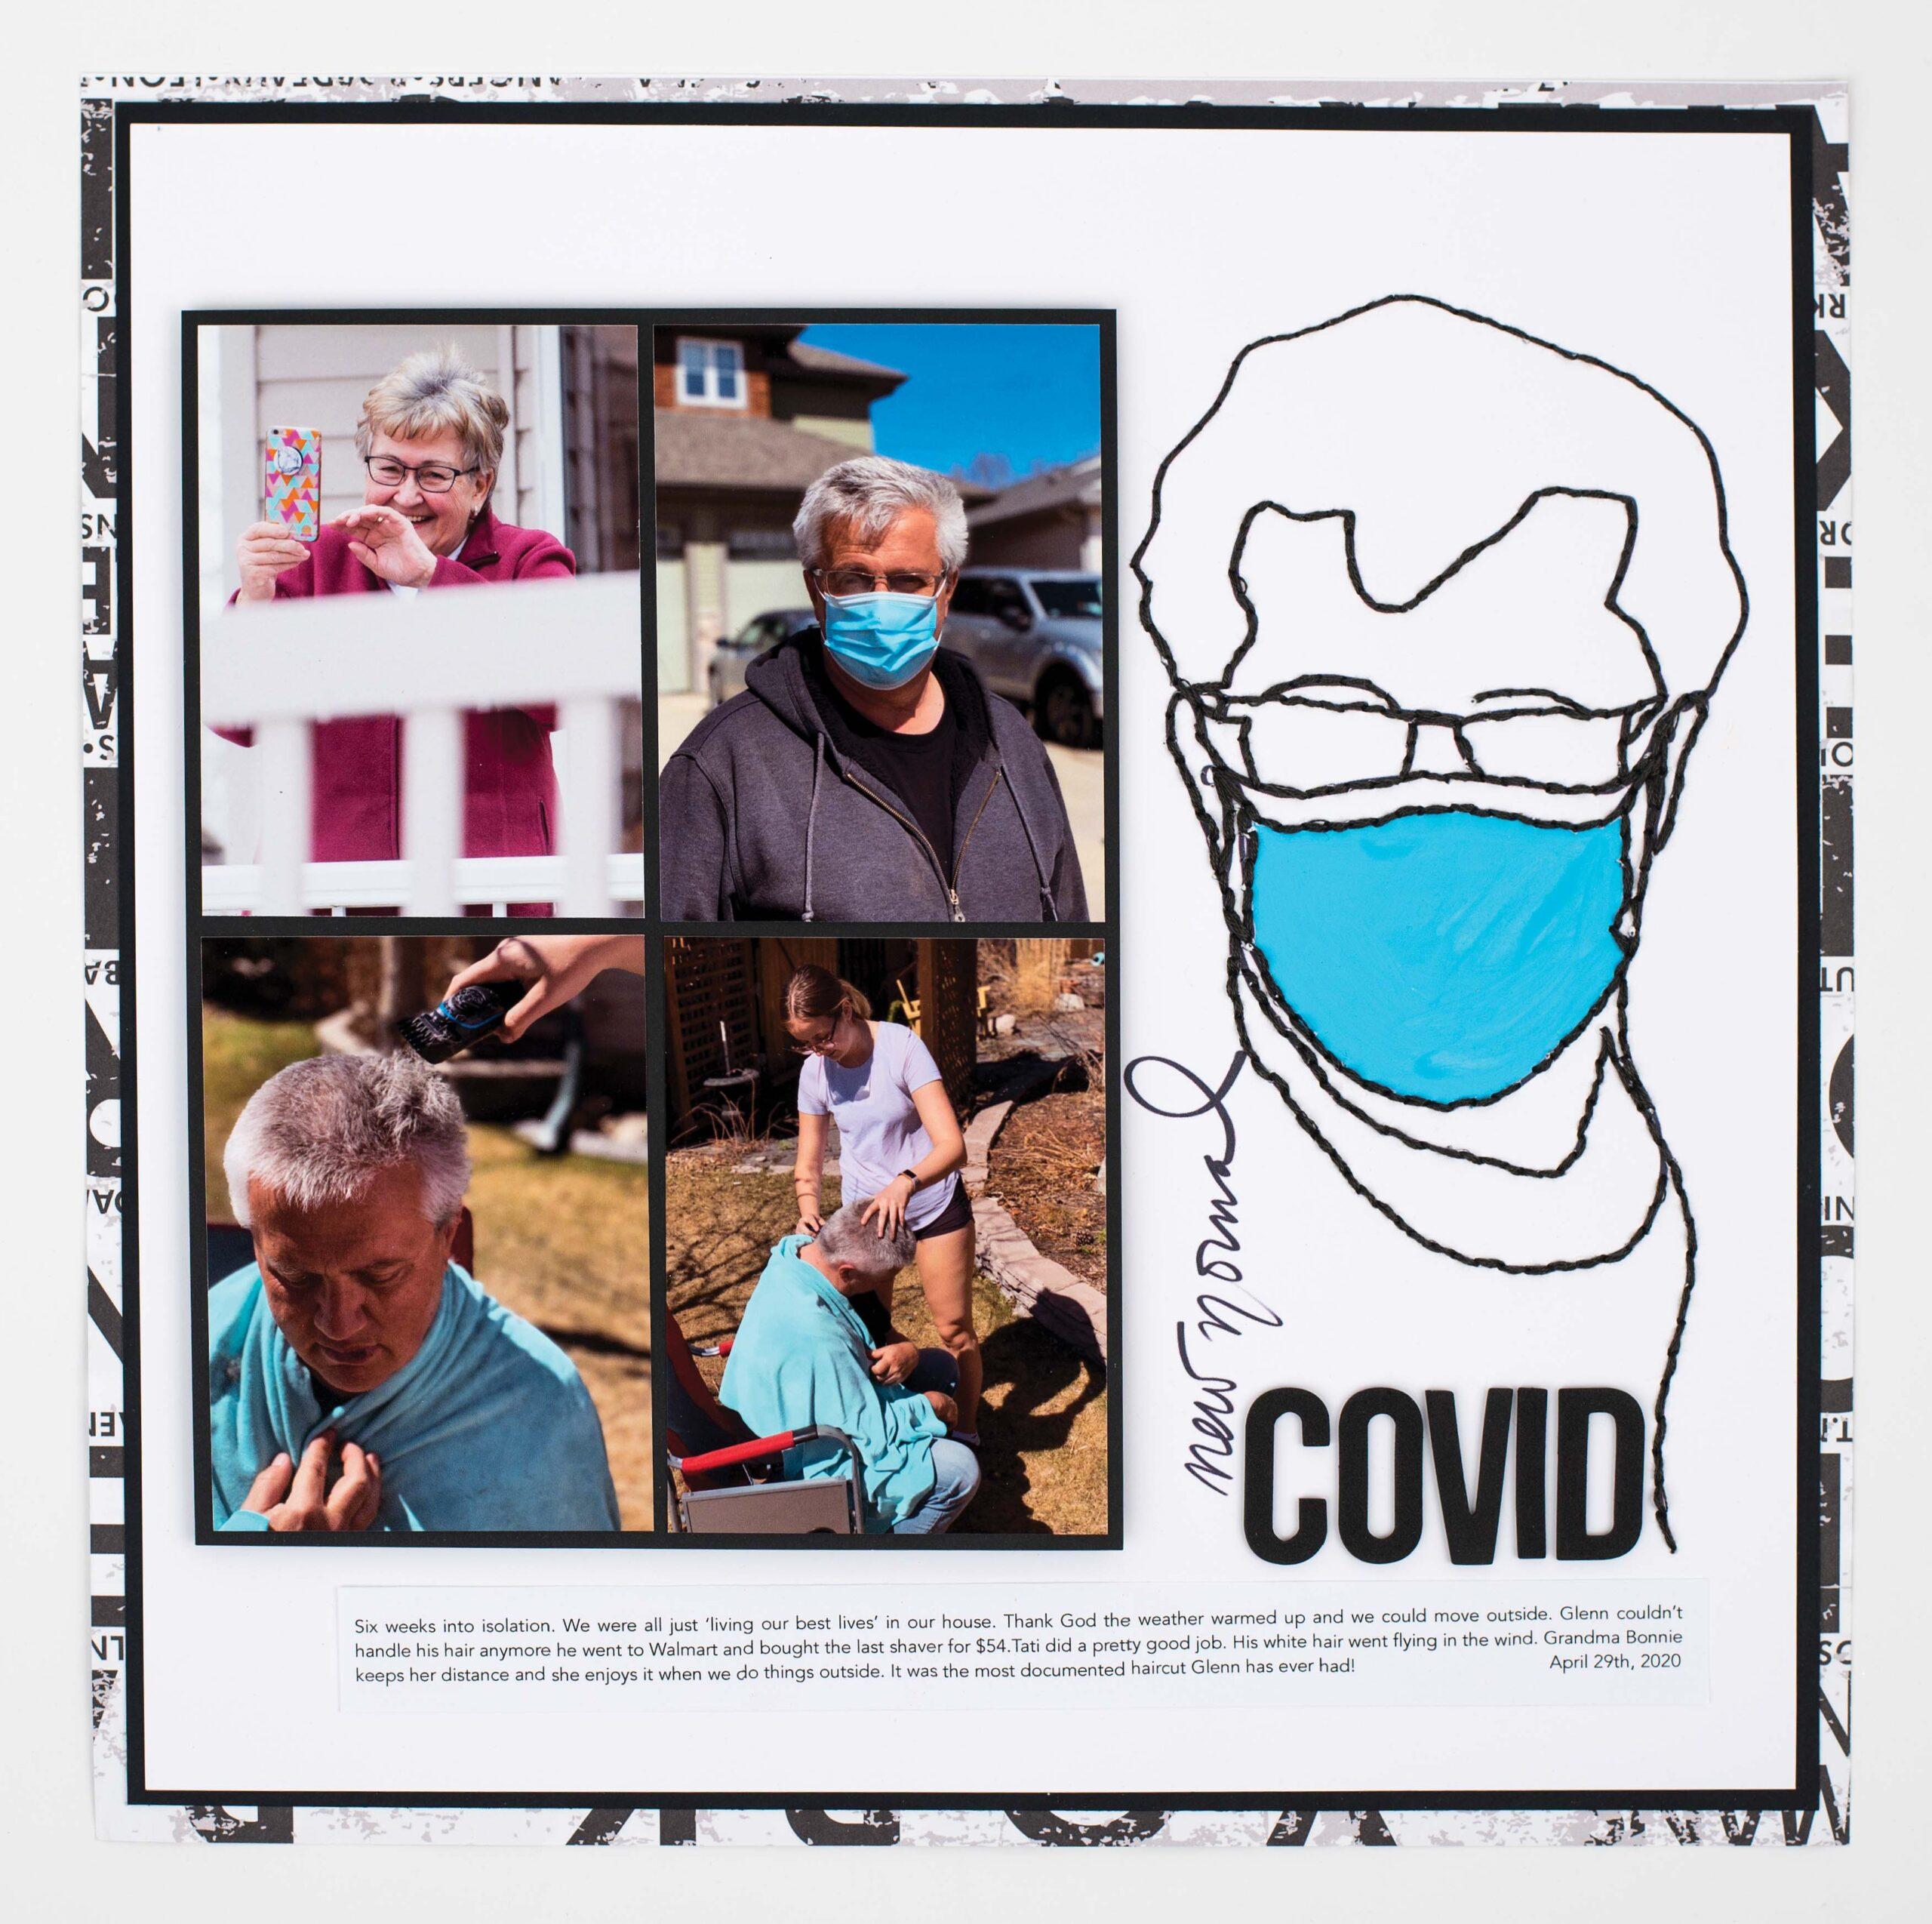 Kerry Engel COVID layout